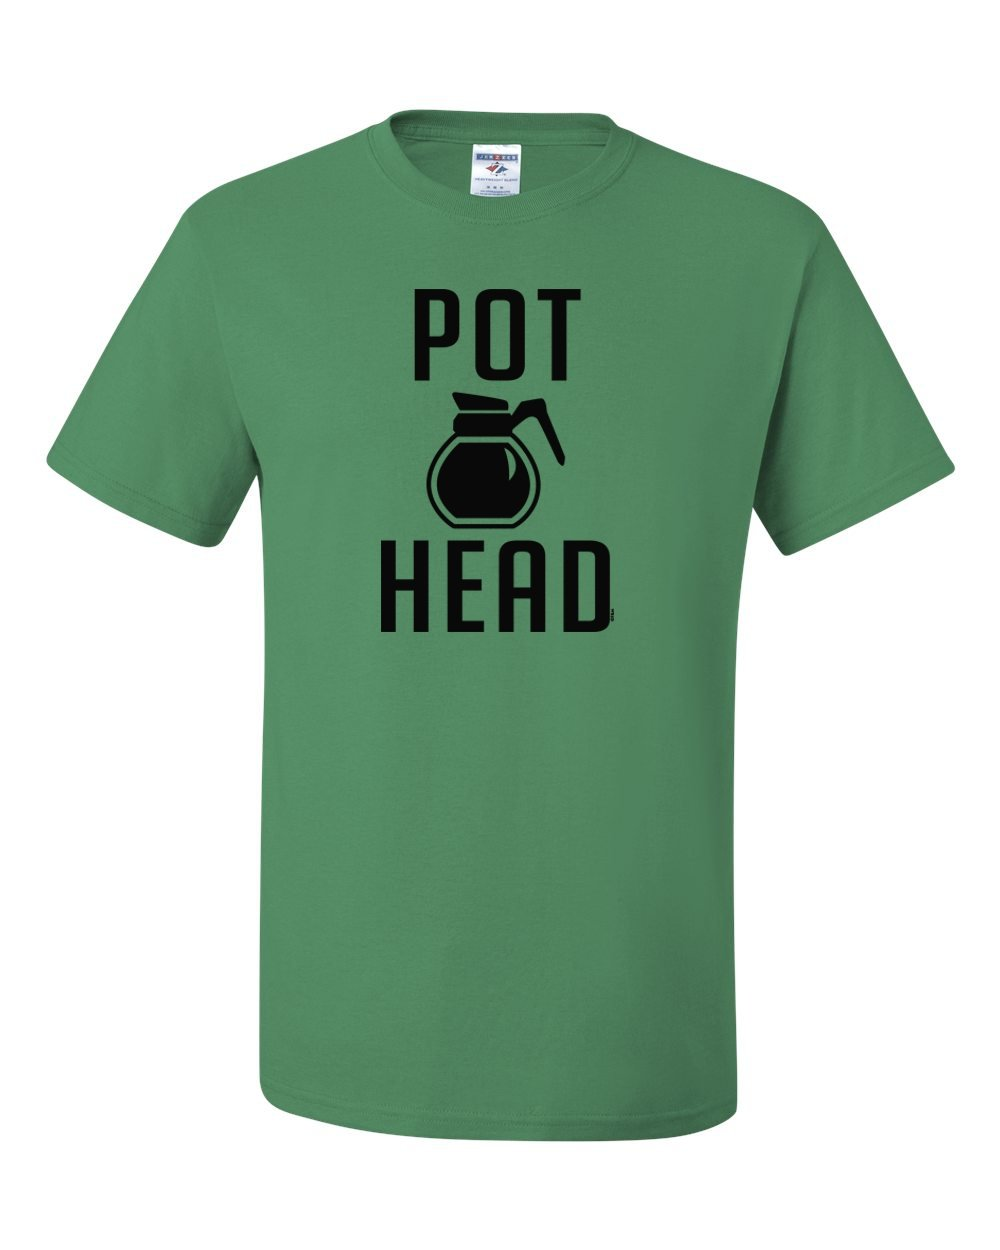 Pot Head Coffee Funny Humor Tee Graphic Unisex Tshirt